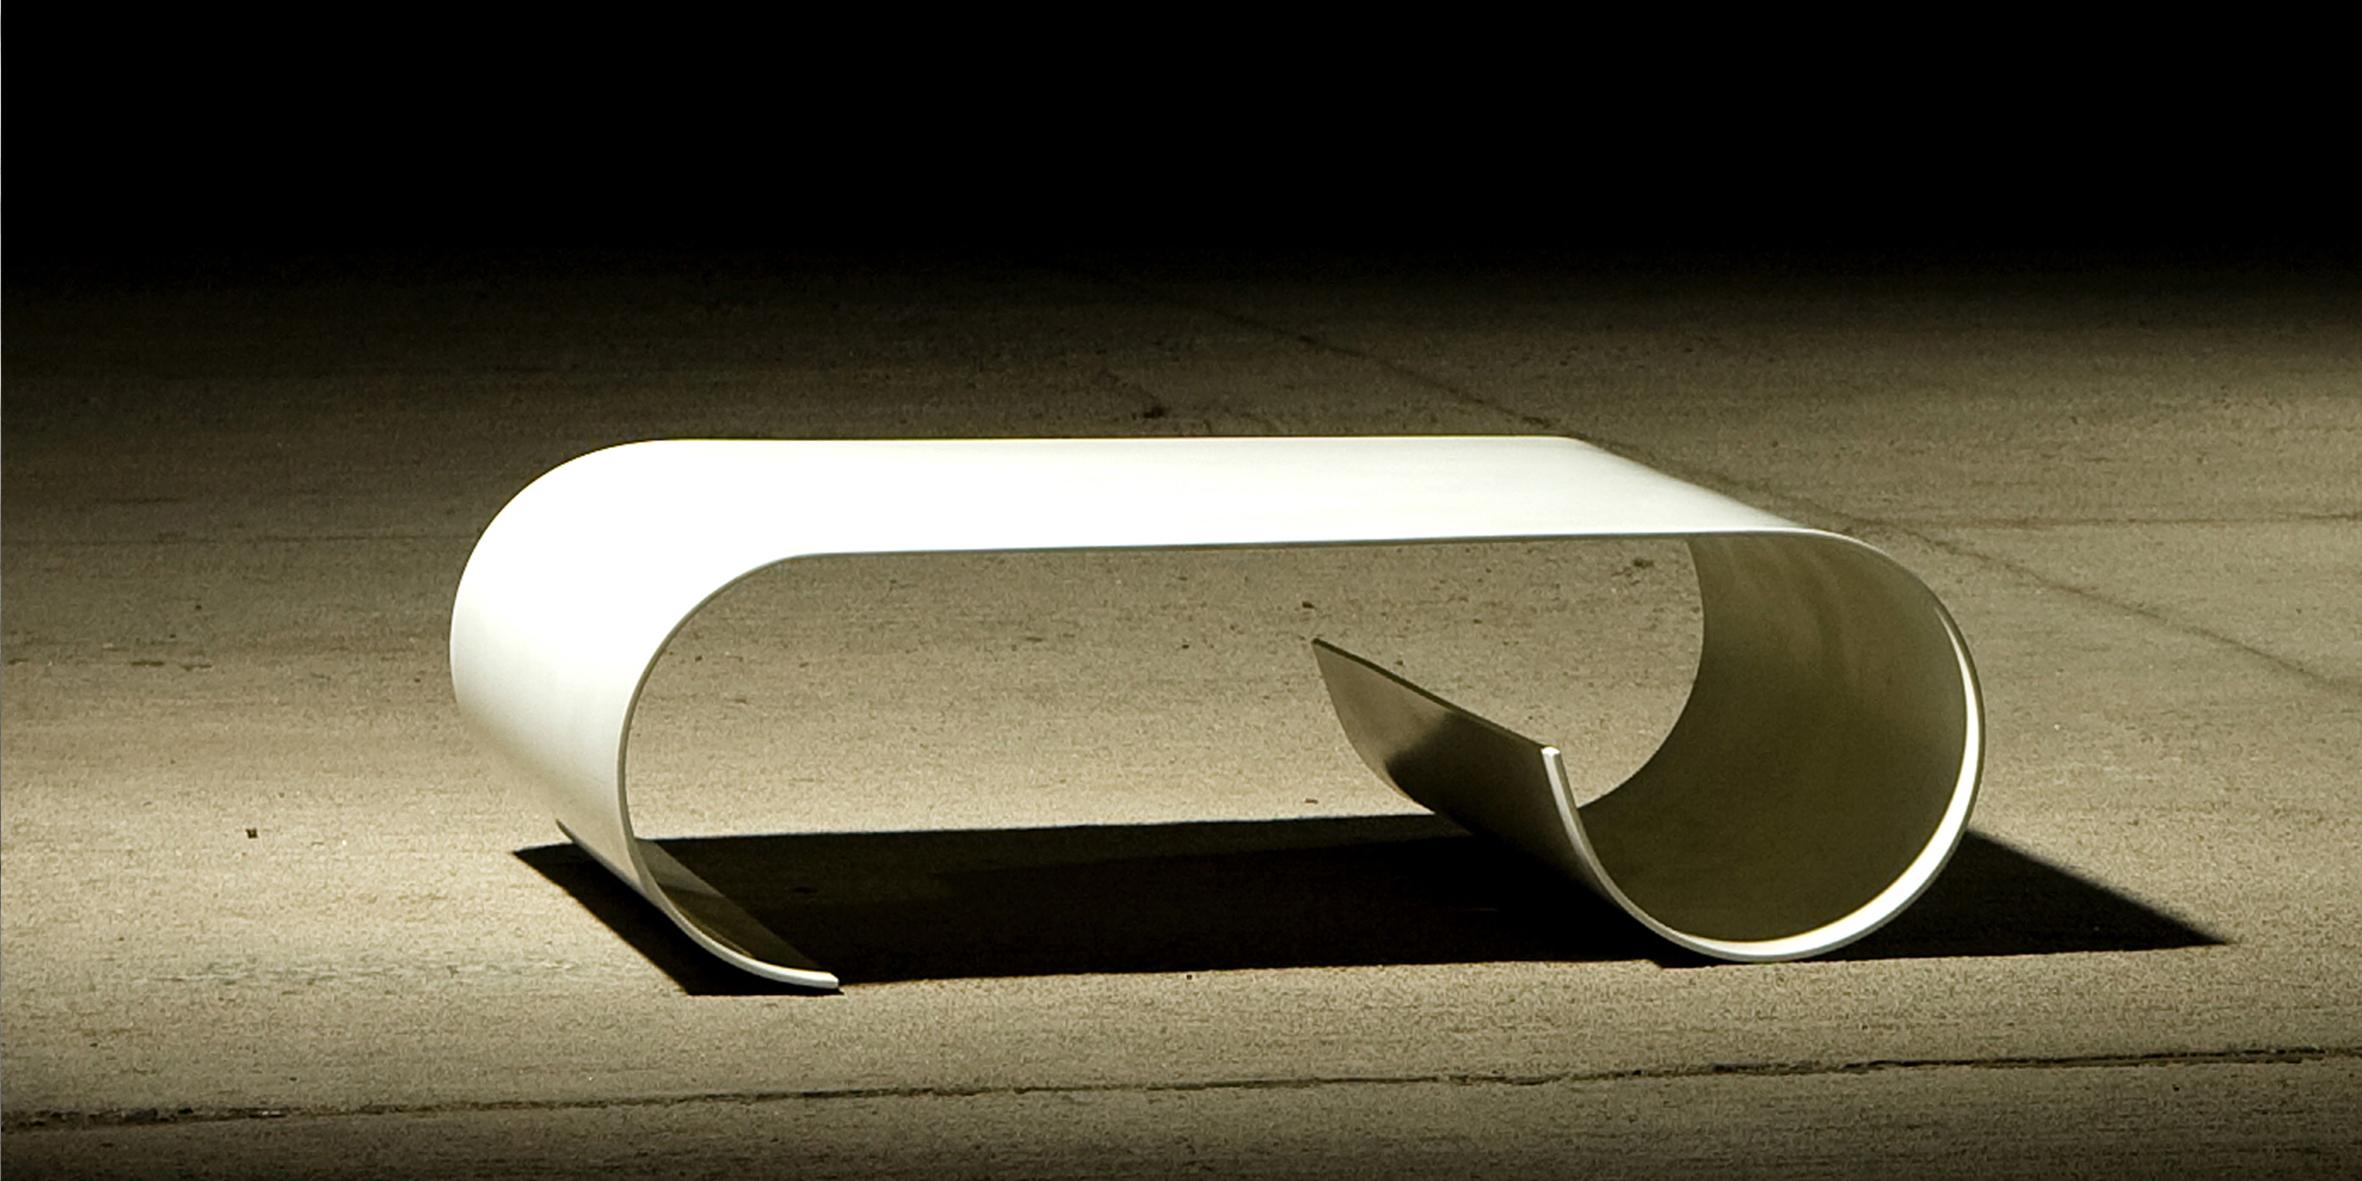 leaf coffee table, 960 l  x 760 w x 300 h, glacier white corian